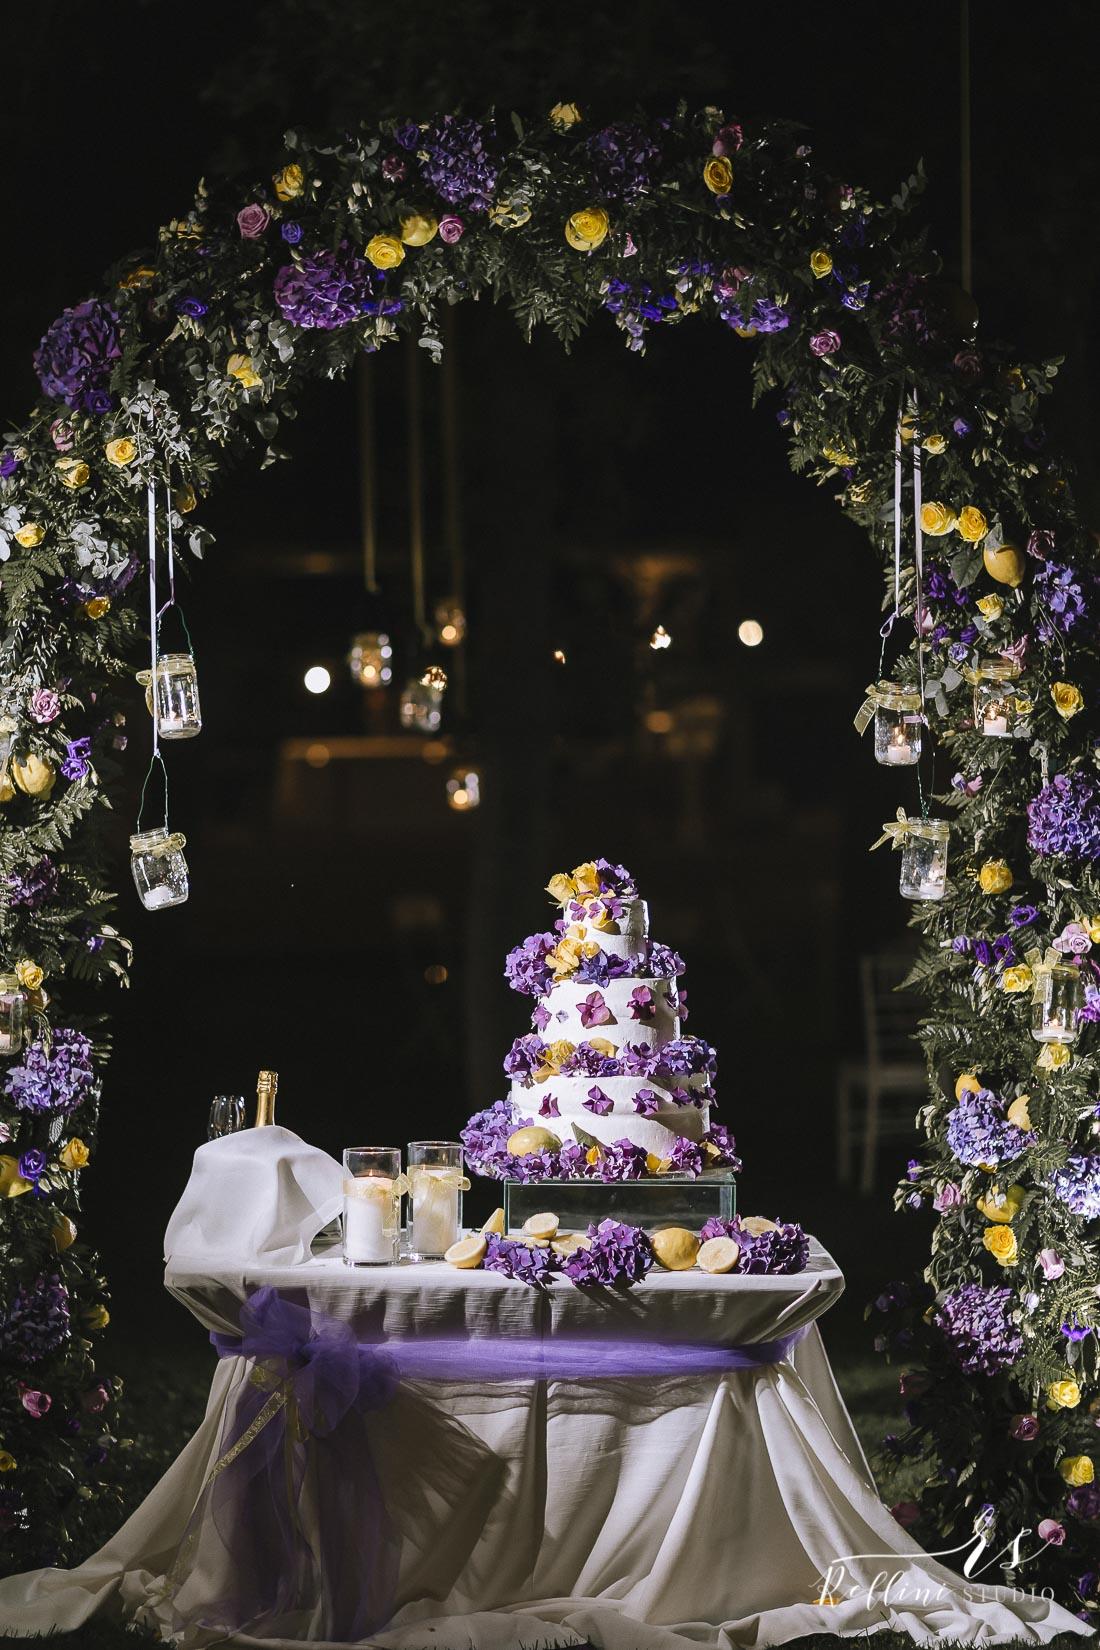 Rosciano castle wedding 107.jpg